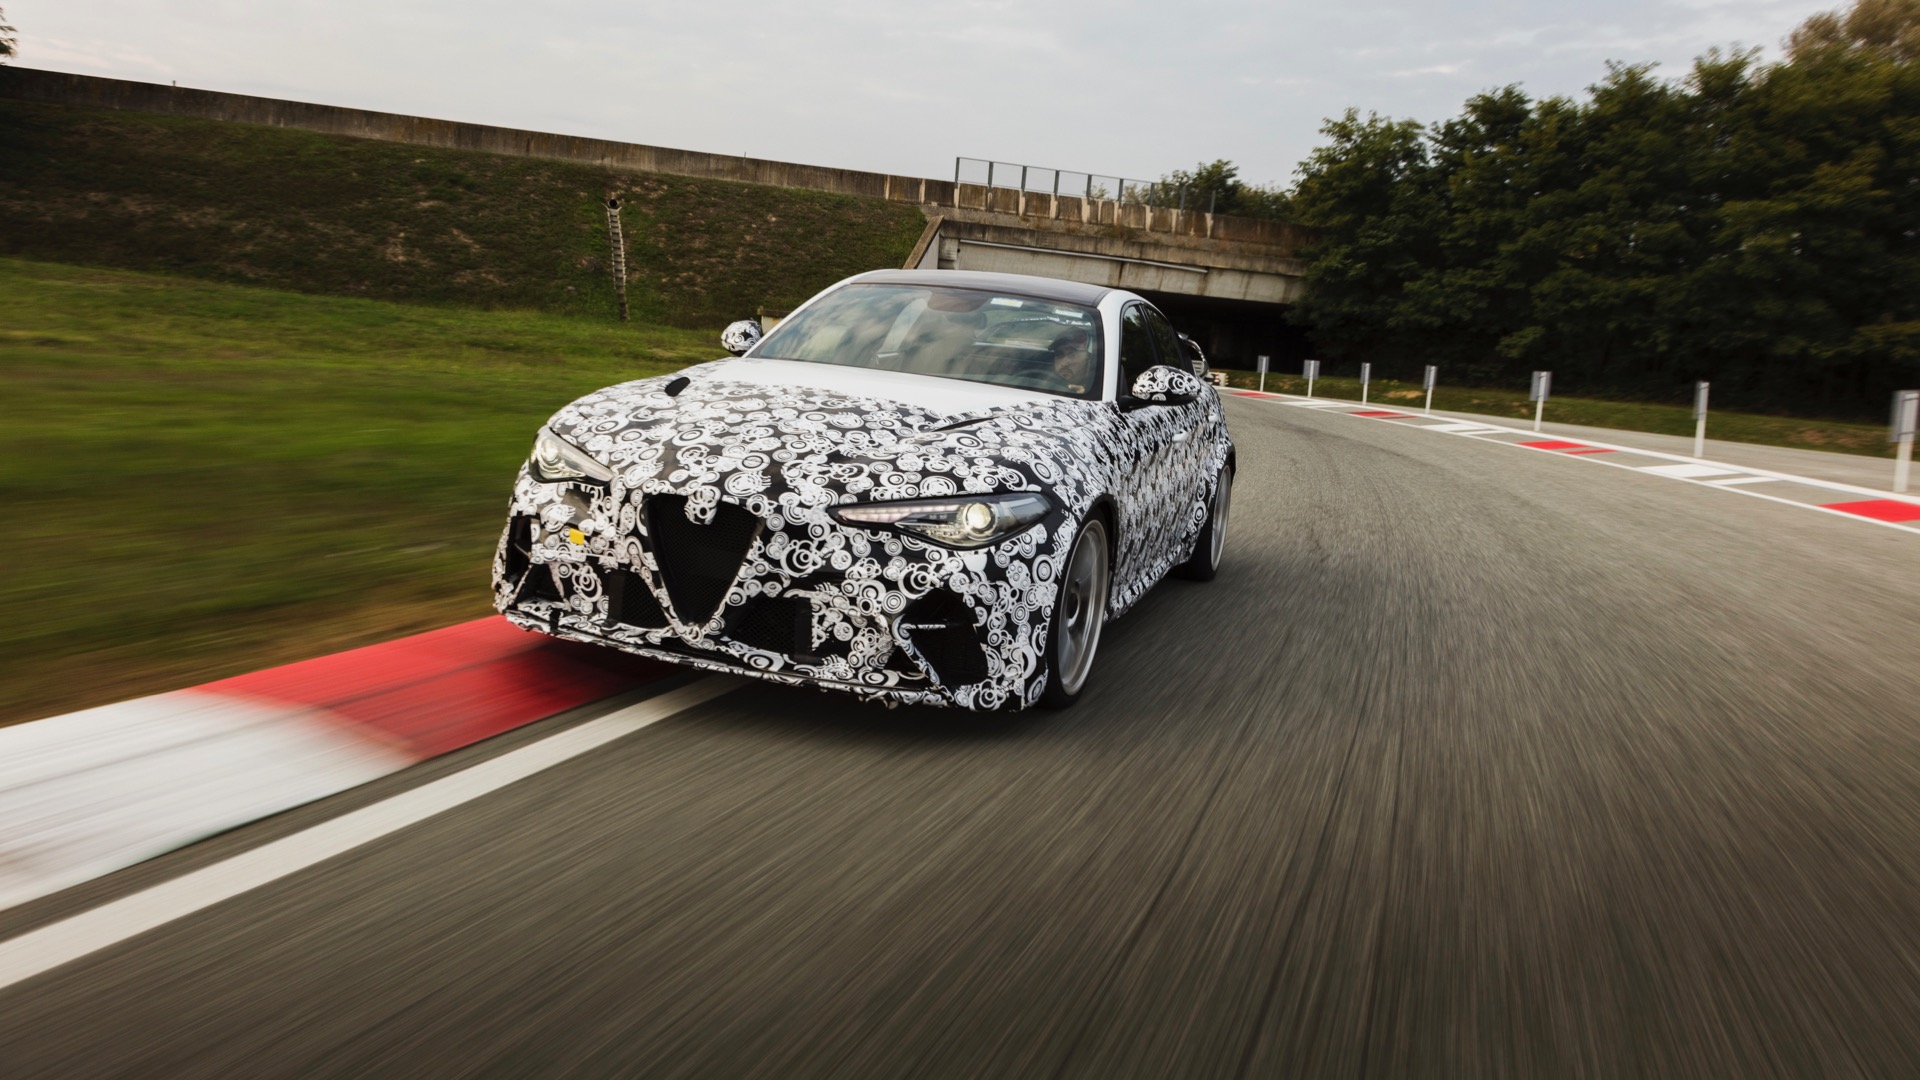 Auto Racing News cover image